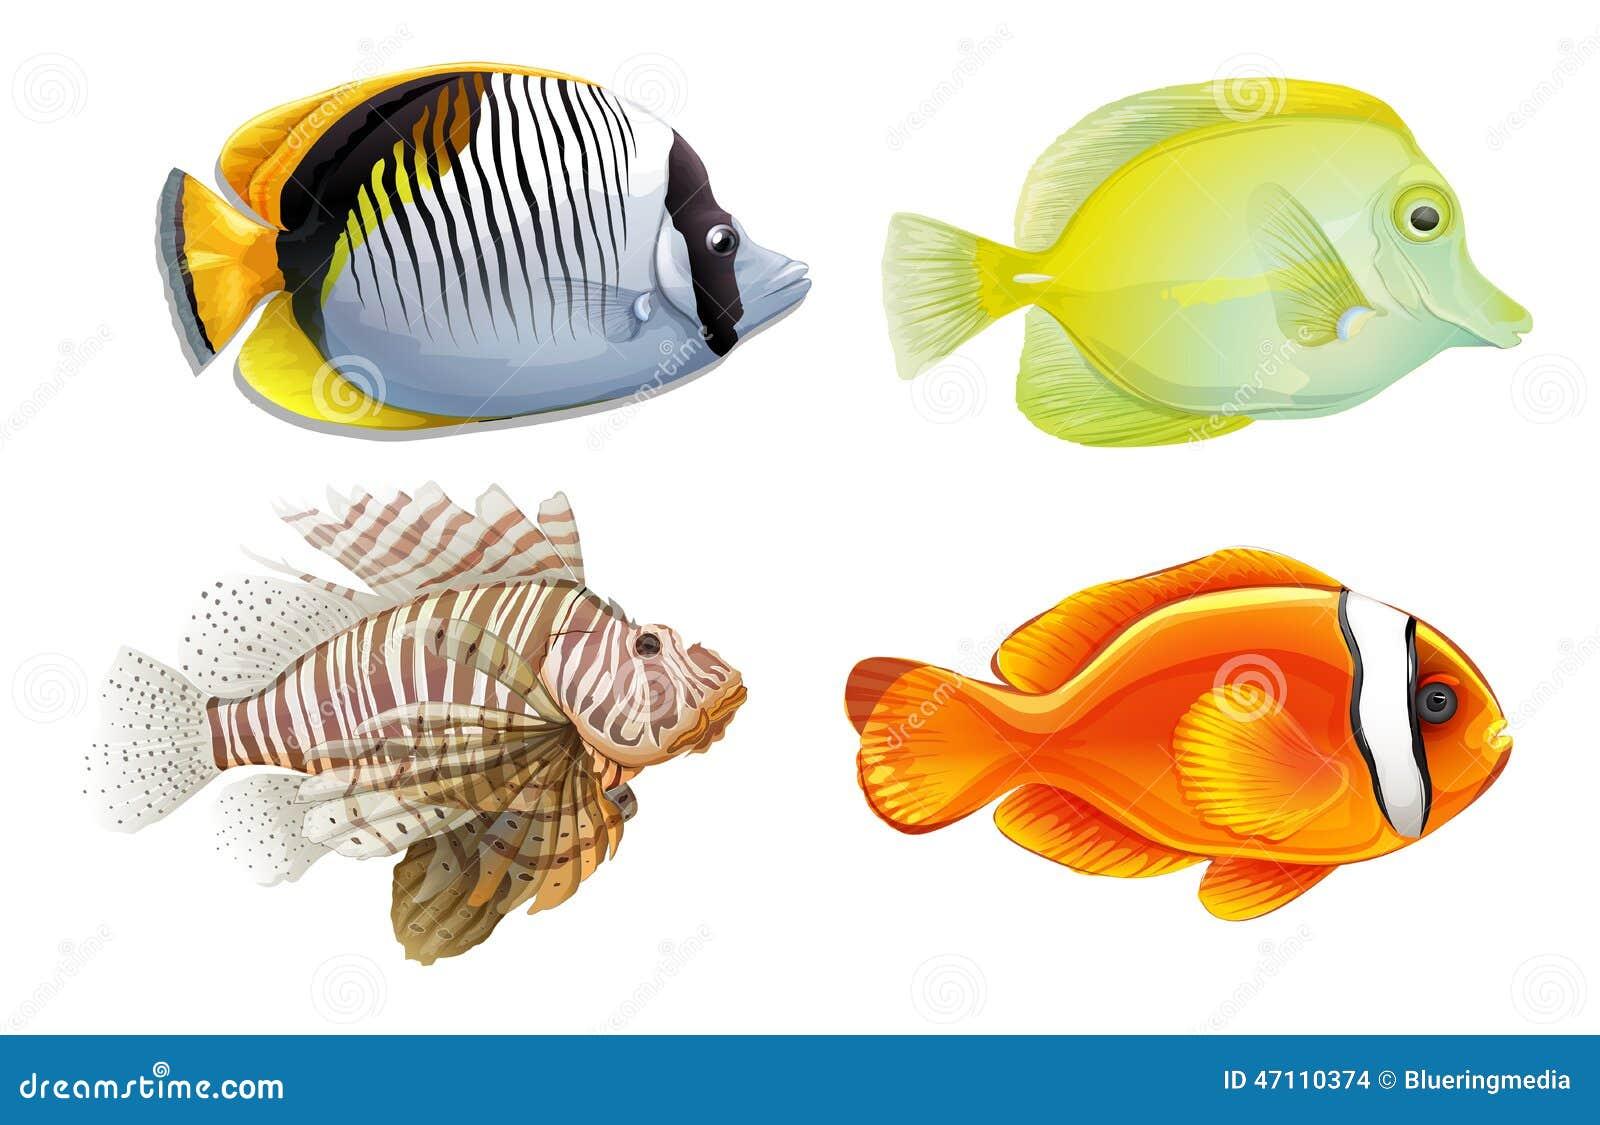 Graphic Lion Fish Pattern Vector Illustration